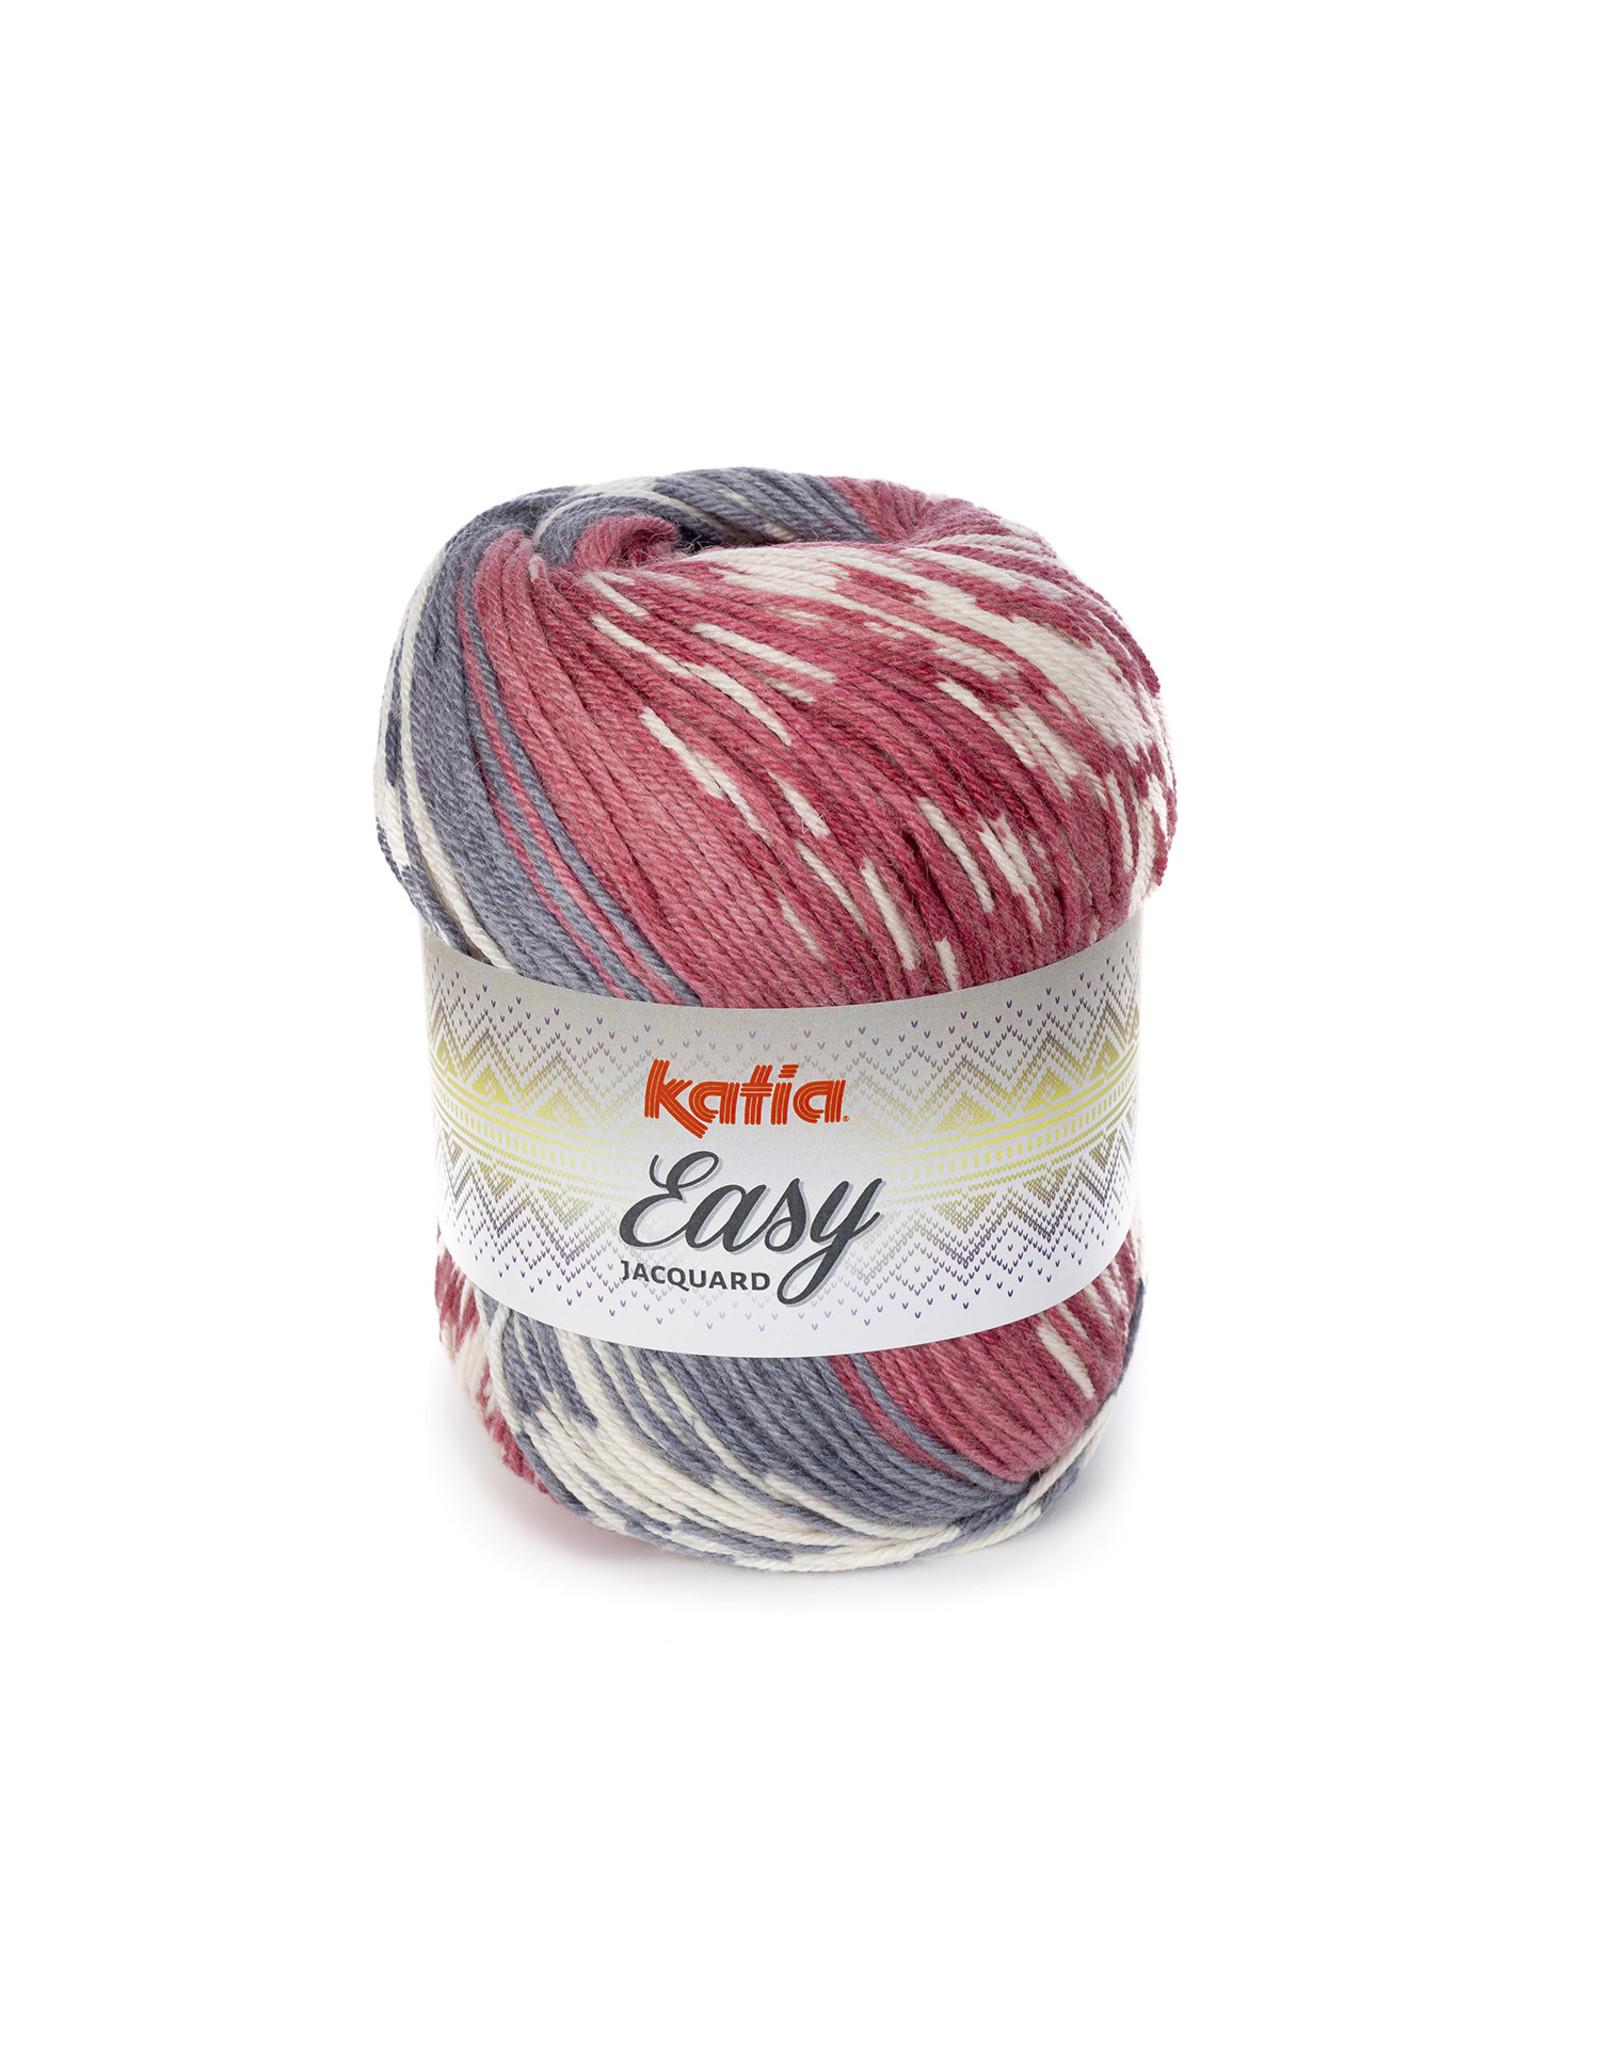 Katia Katia Easy Jacquard